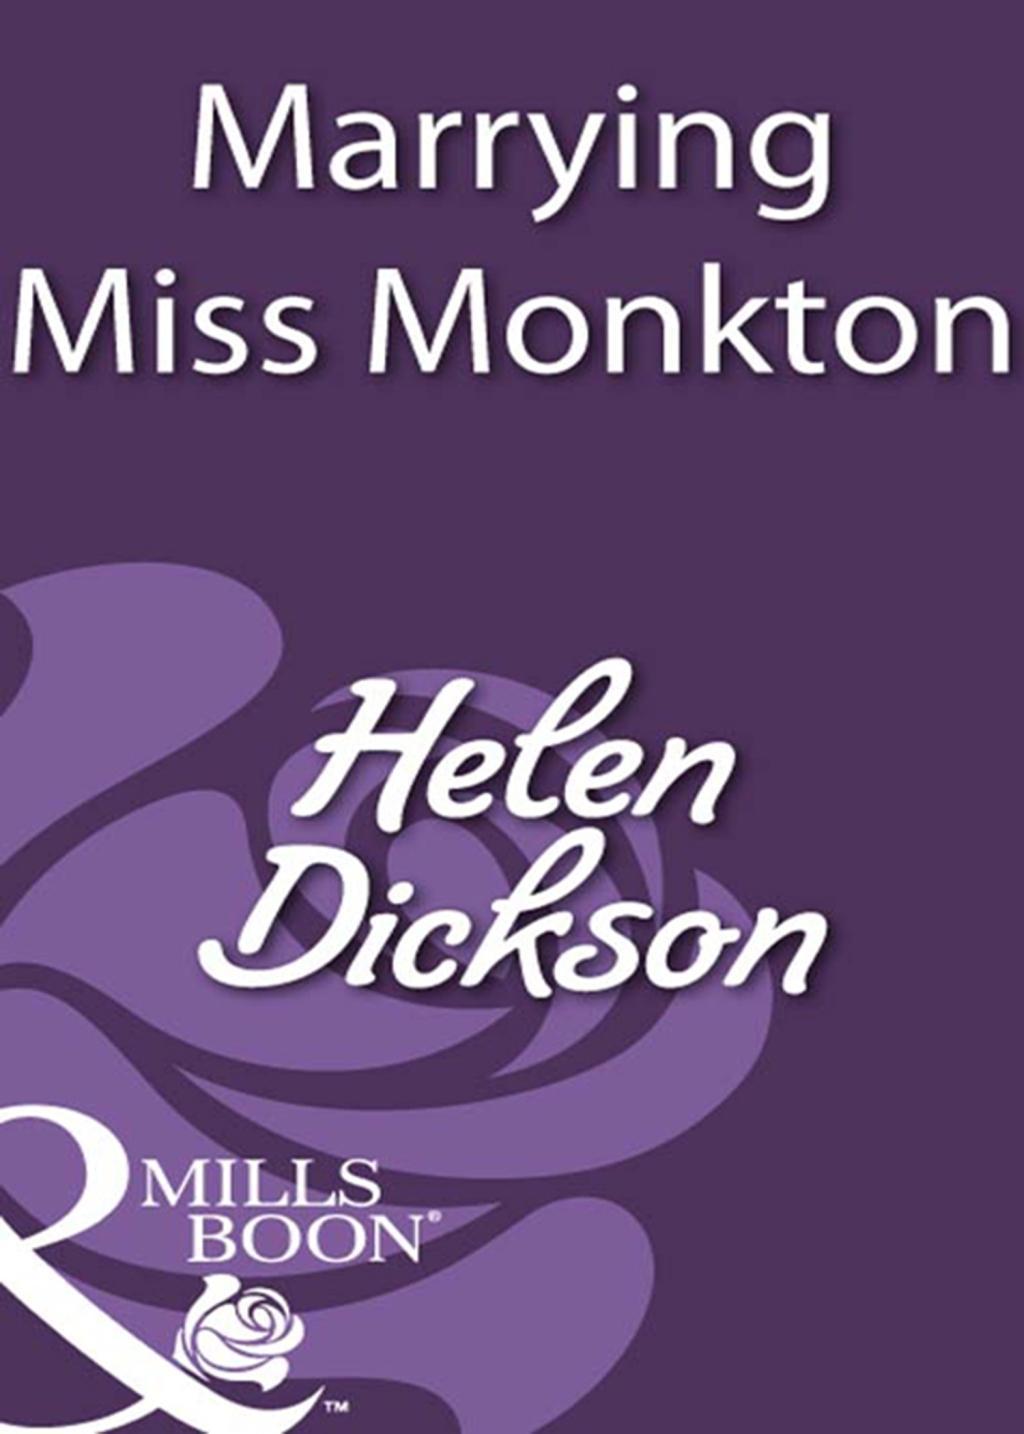 Marrying Miss Monkton (Mills & Boon Historical)